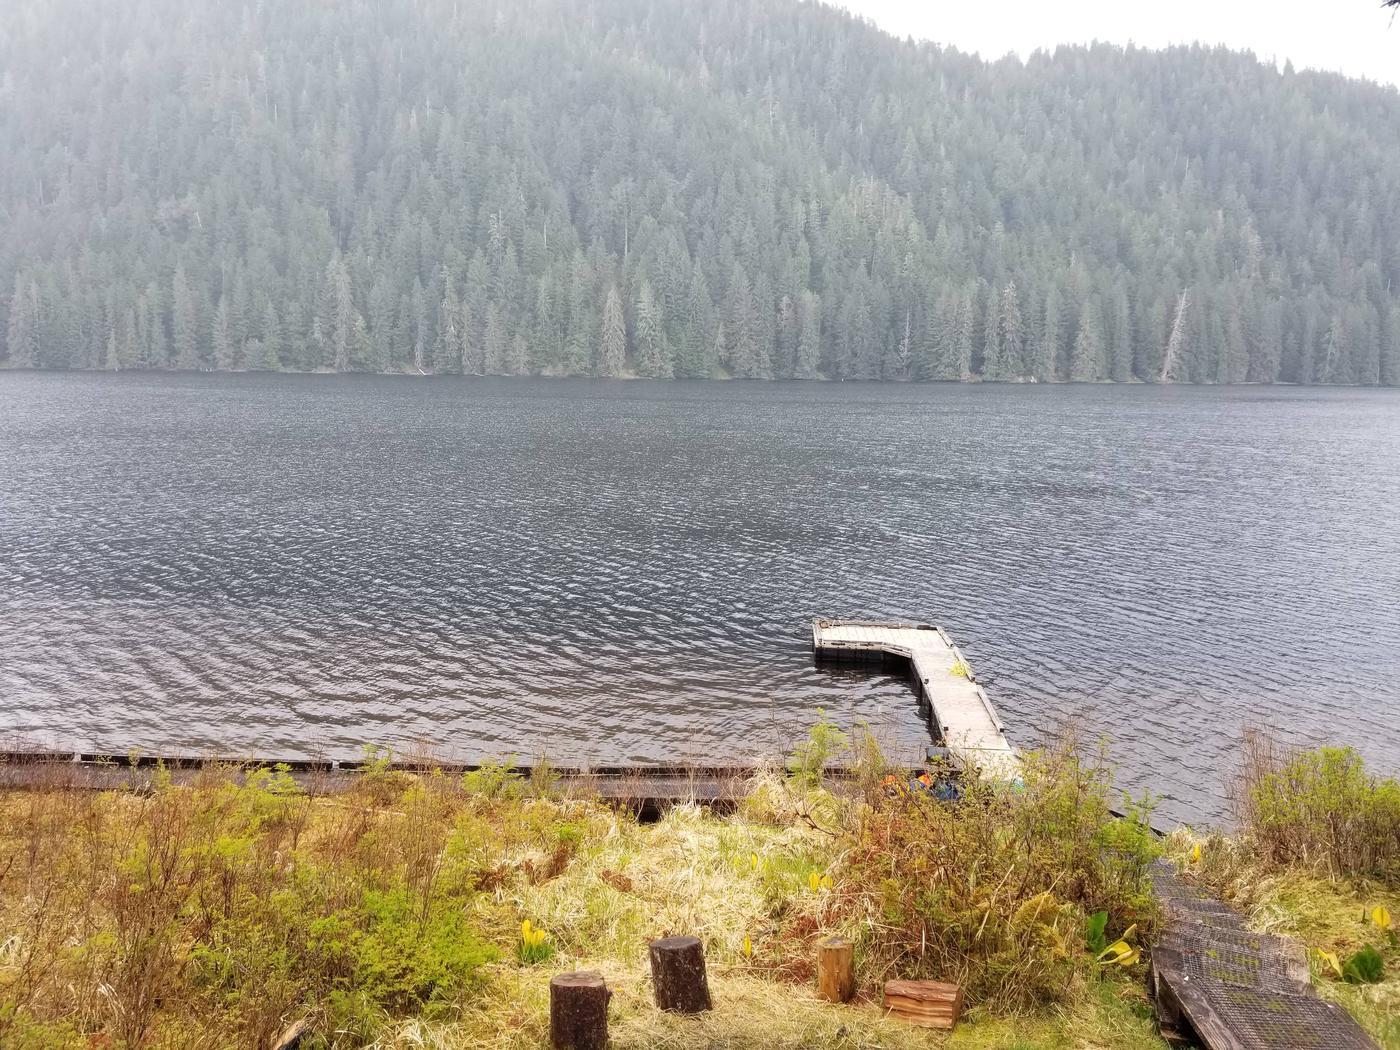 Heckman Lake with Dock